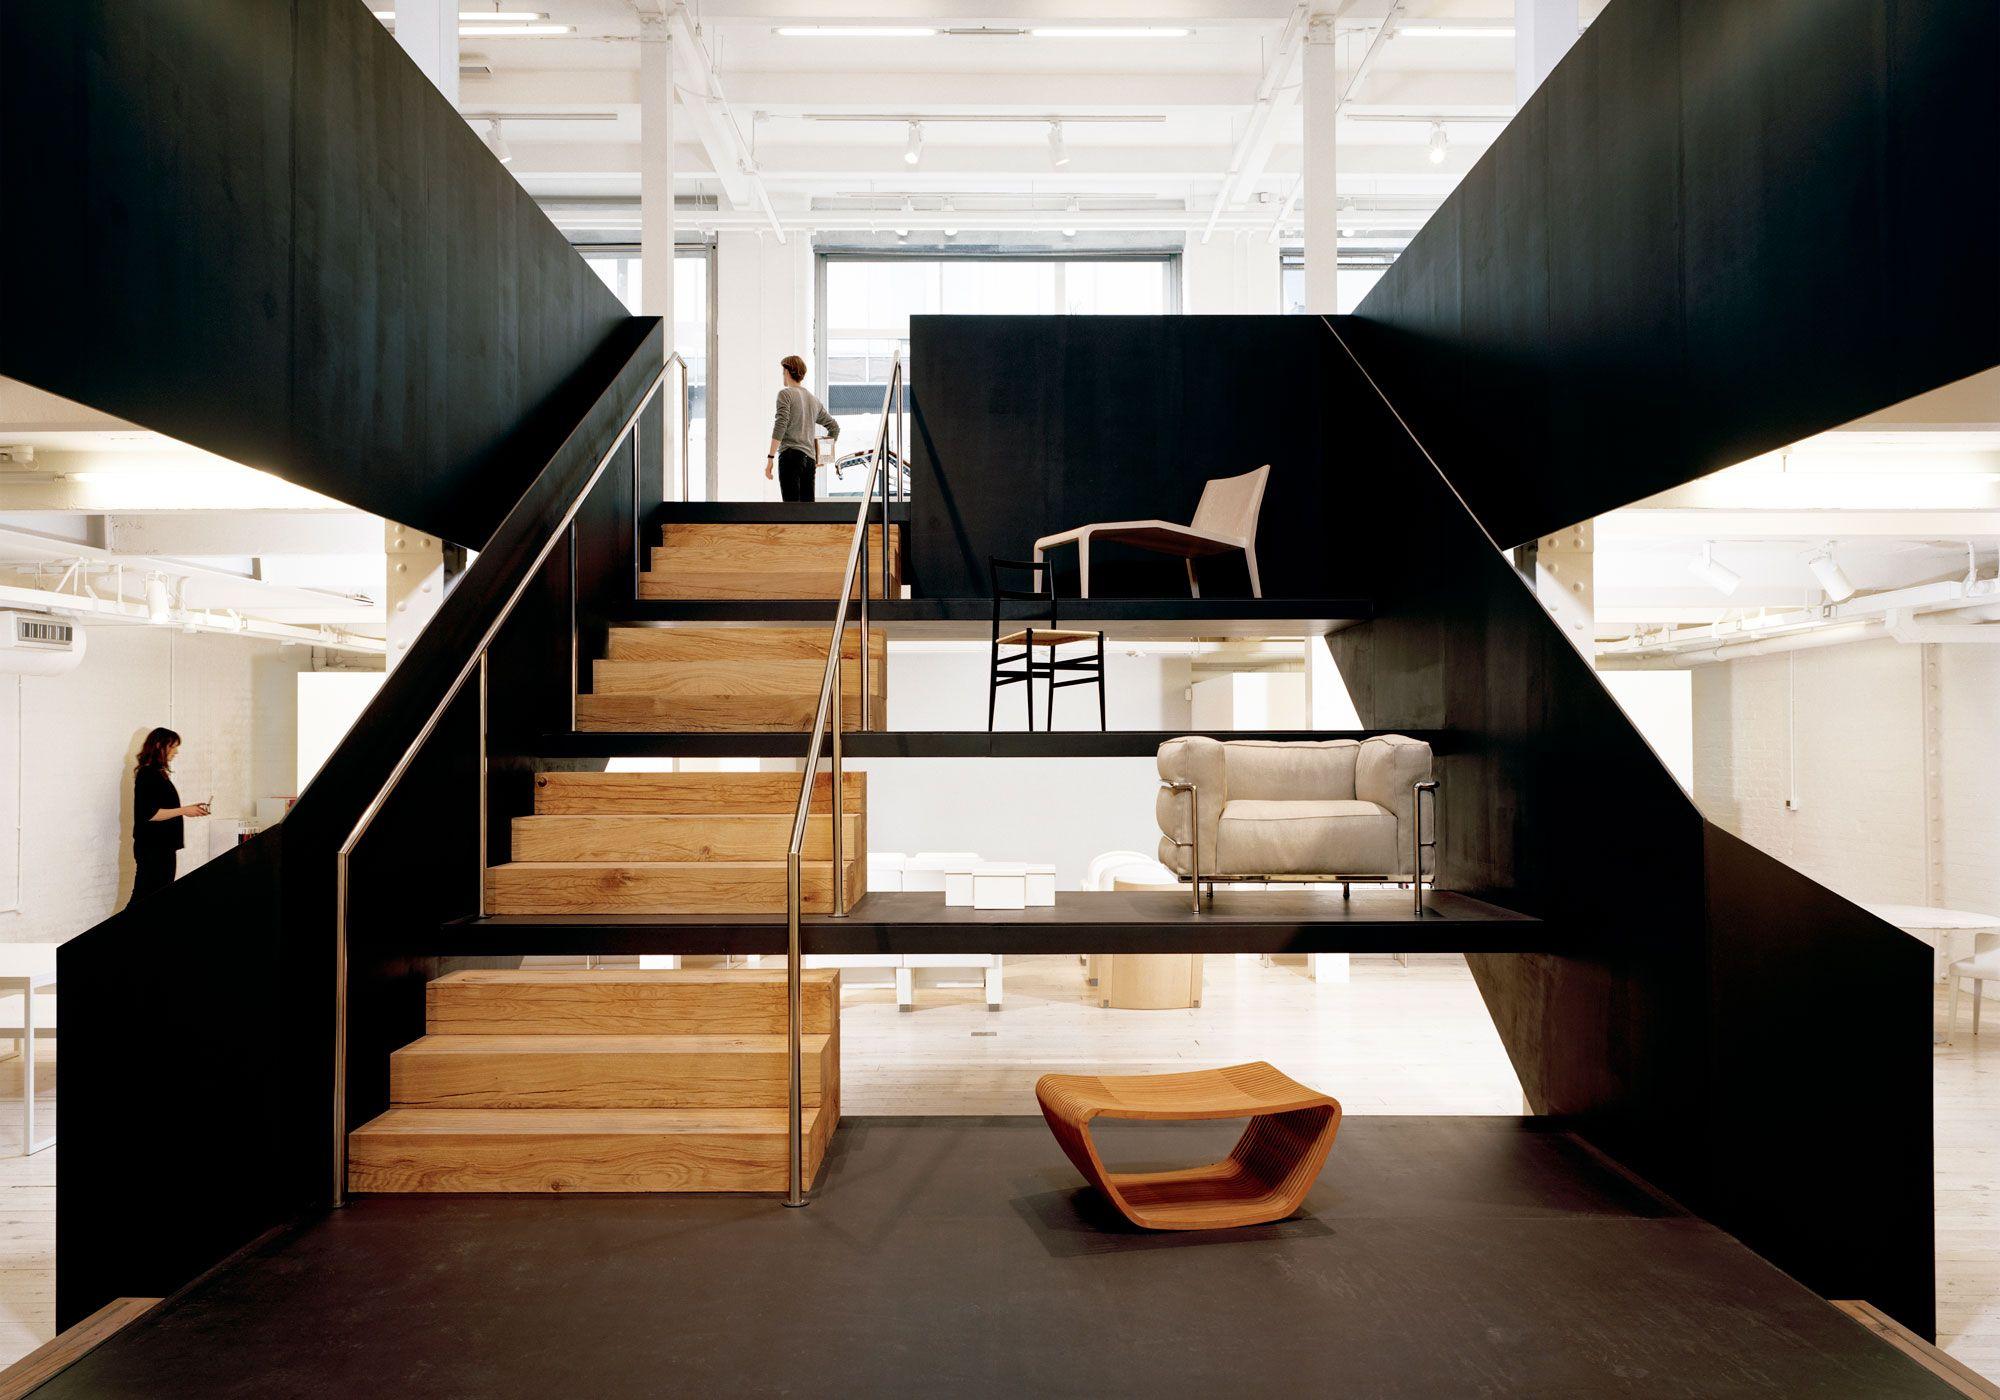 Poltrona Frau Showroom London Interior Architecture Design Staircase Design Interior Design Studio